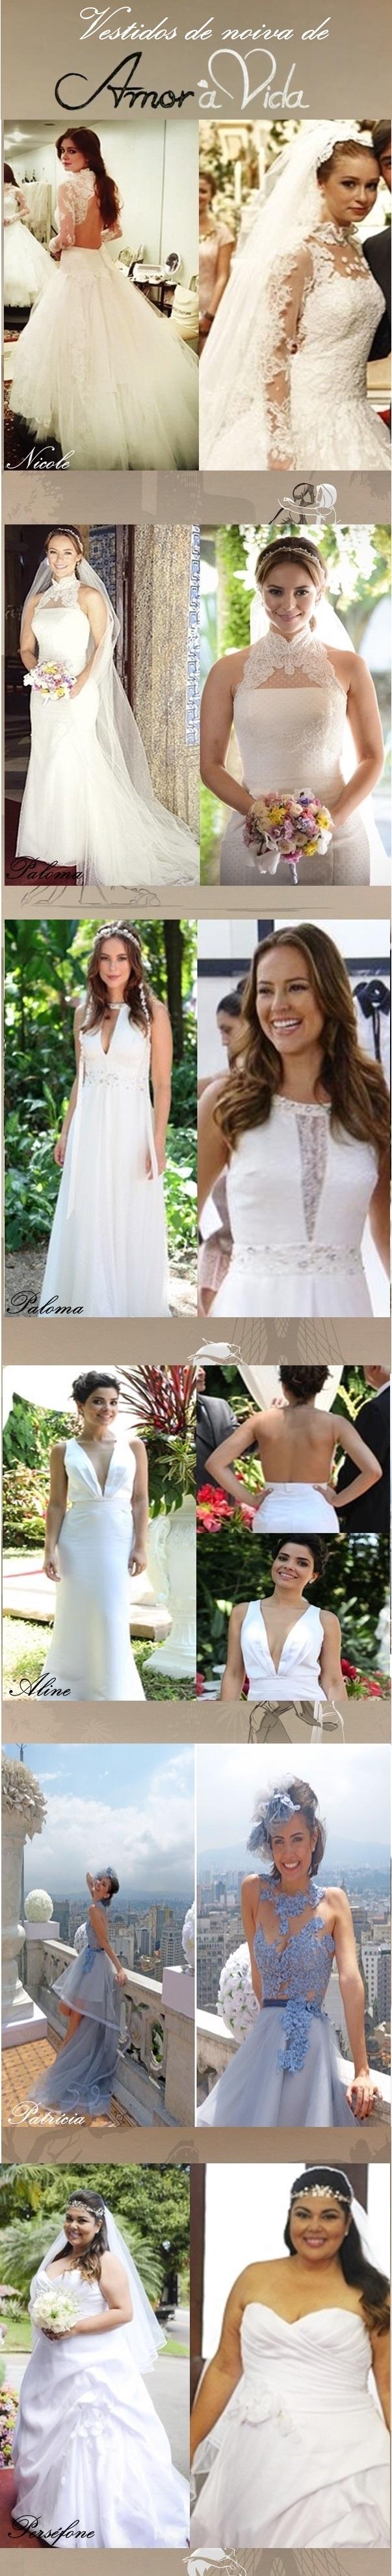 vestidos de noiva de amor a vida